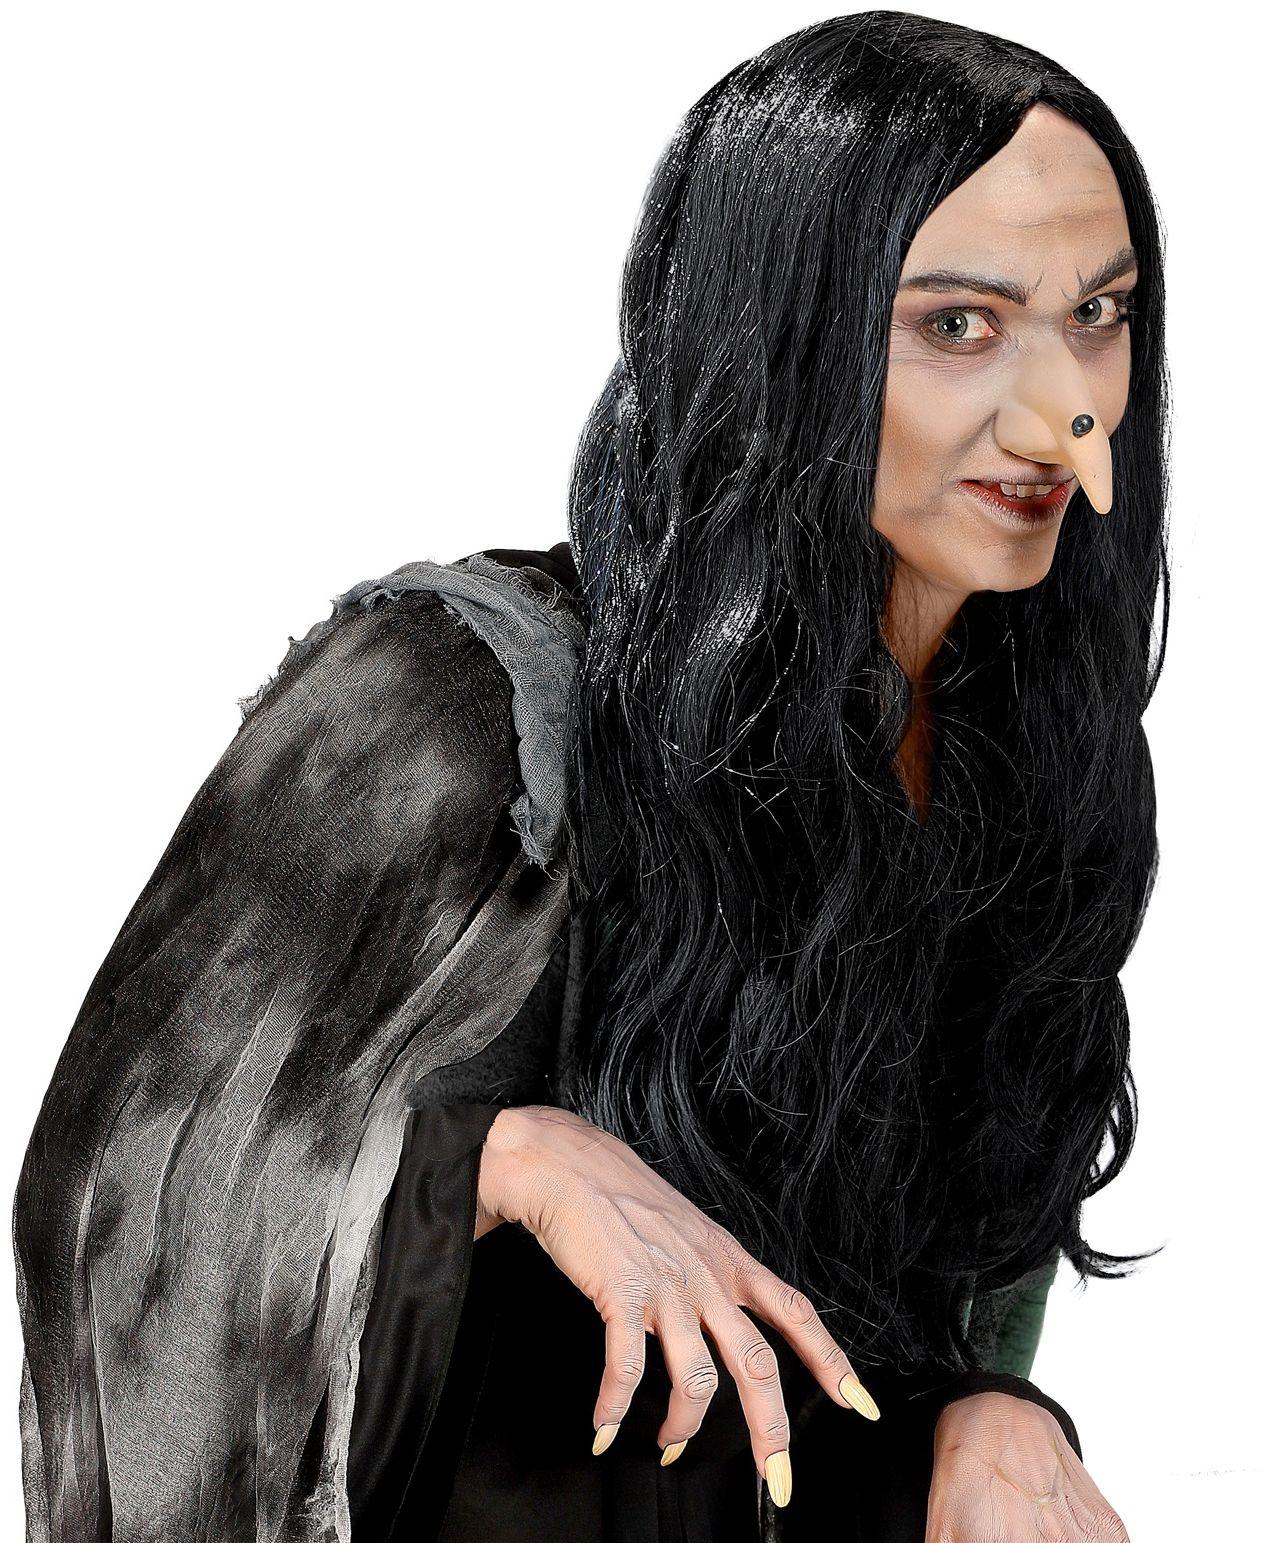 Zwarte heksen pruik